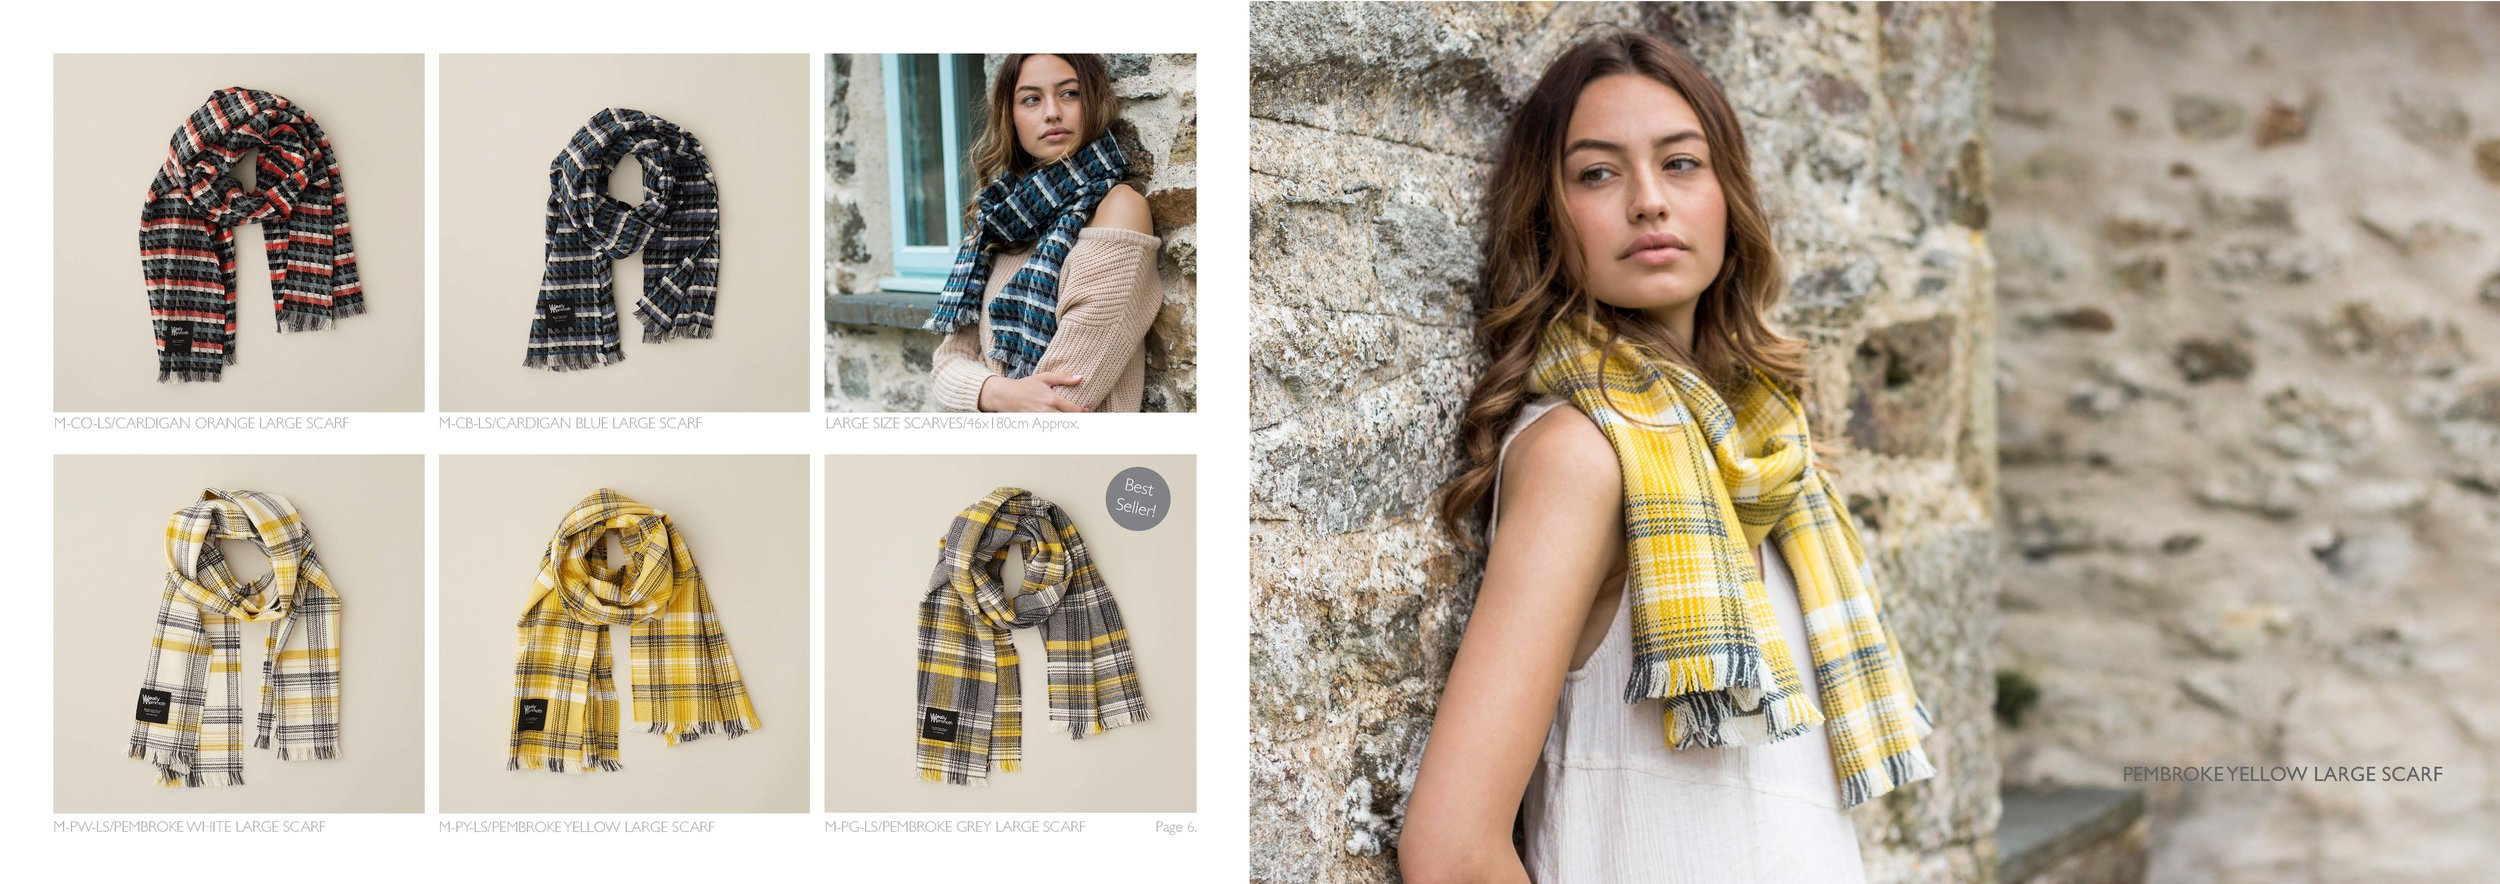 Wholesale Catalogue 2018 1_Page_4.jpg